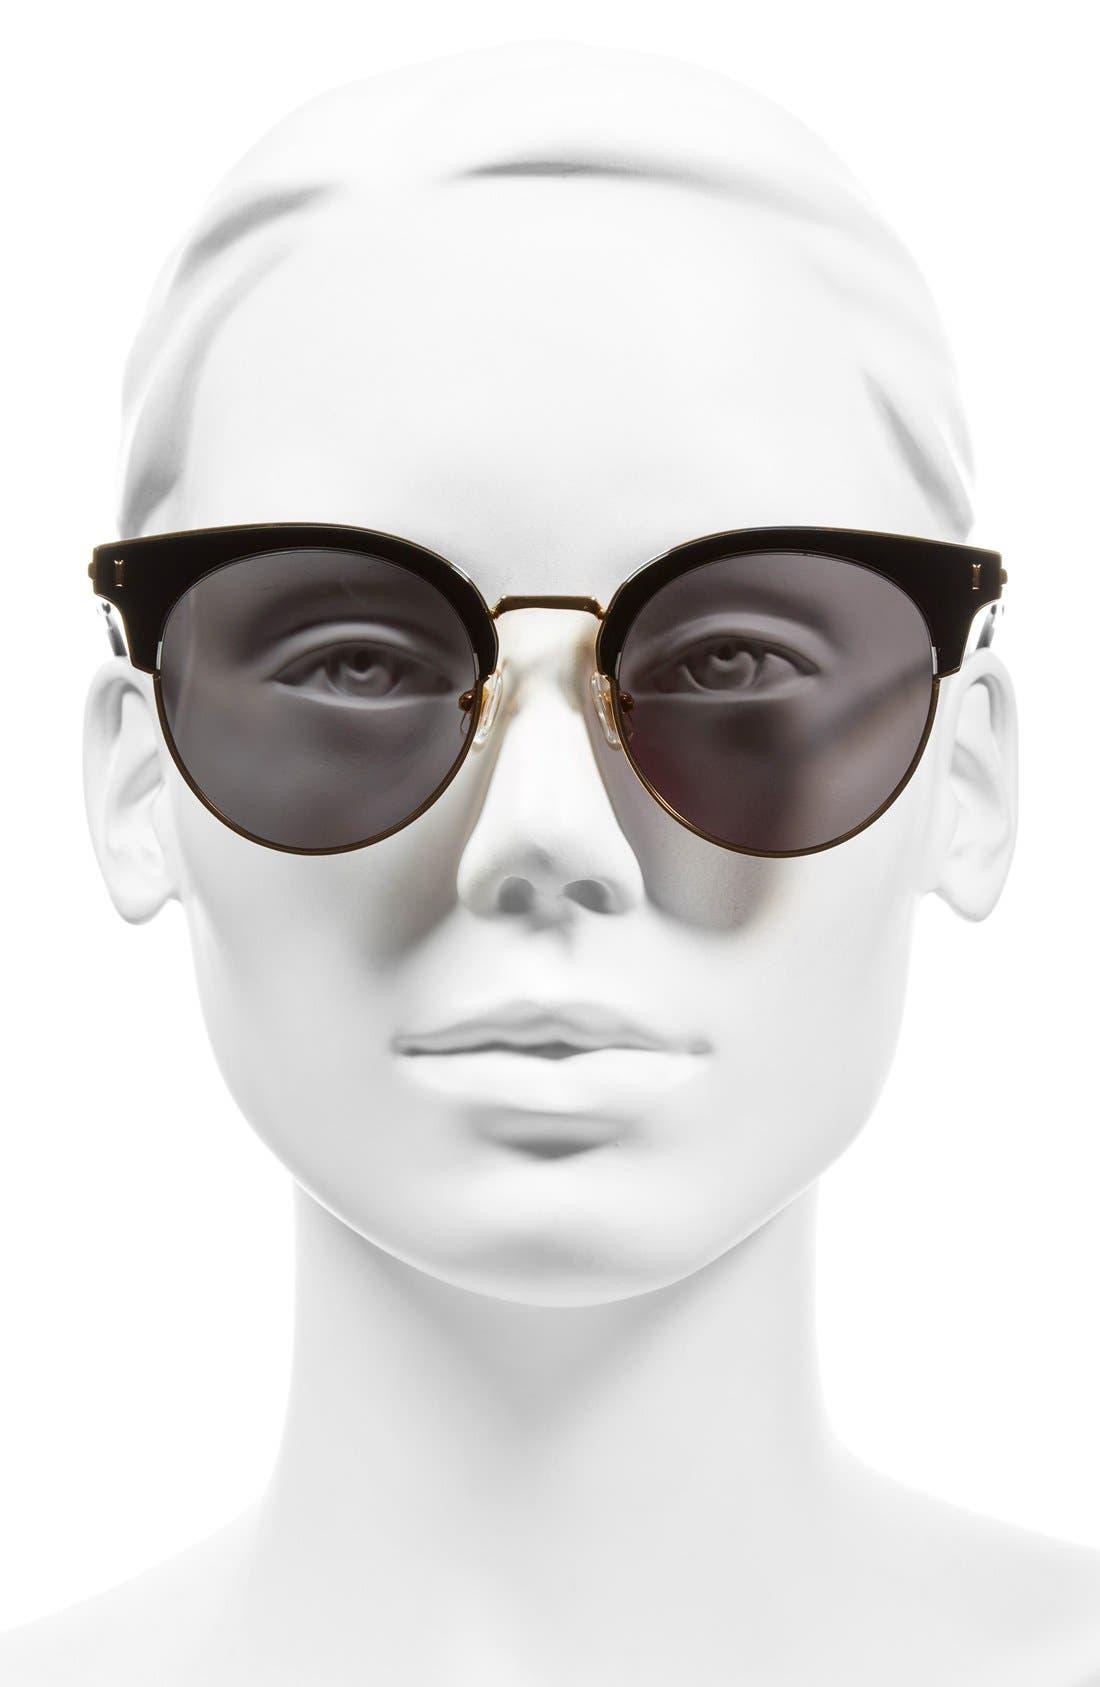 Alternate Image 2  - Gentle Monster Sunglasses 'Kong Hyo Jin - Type 1' 58mm Sunglasses